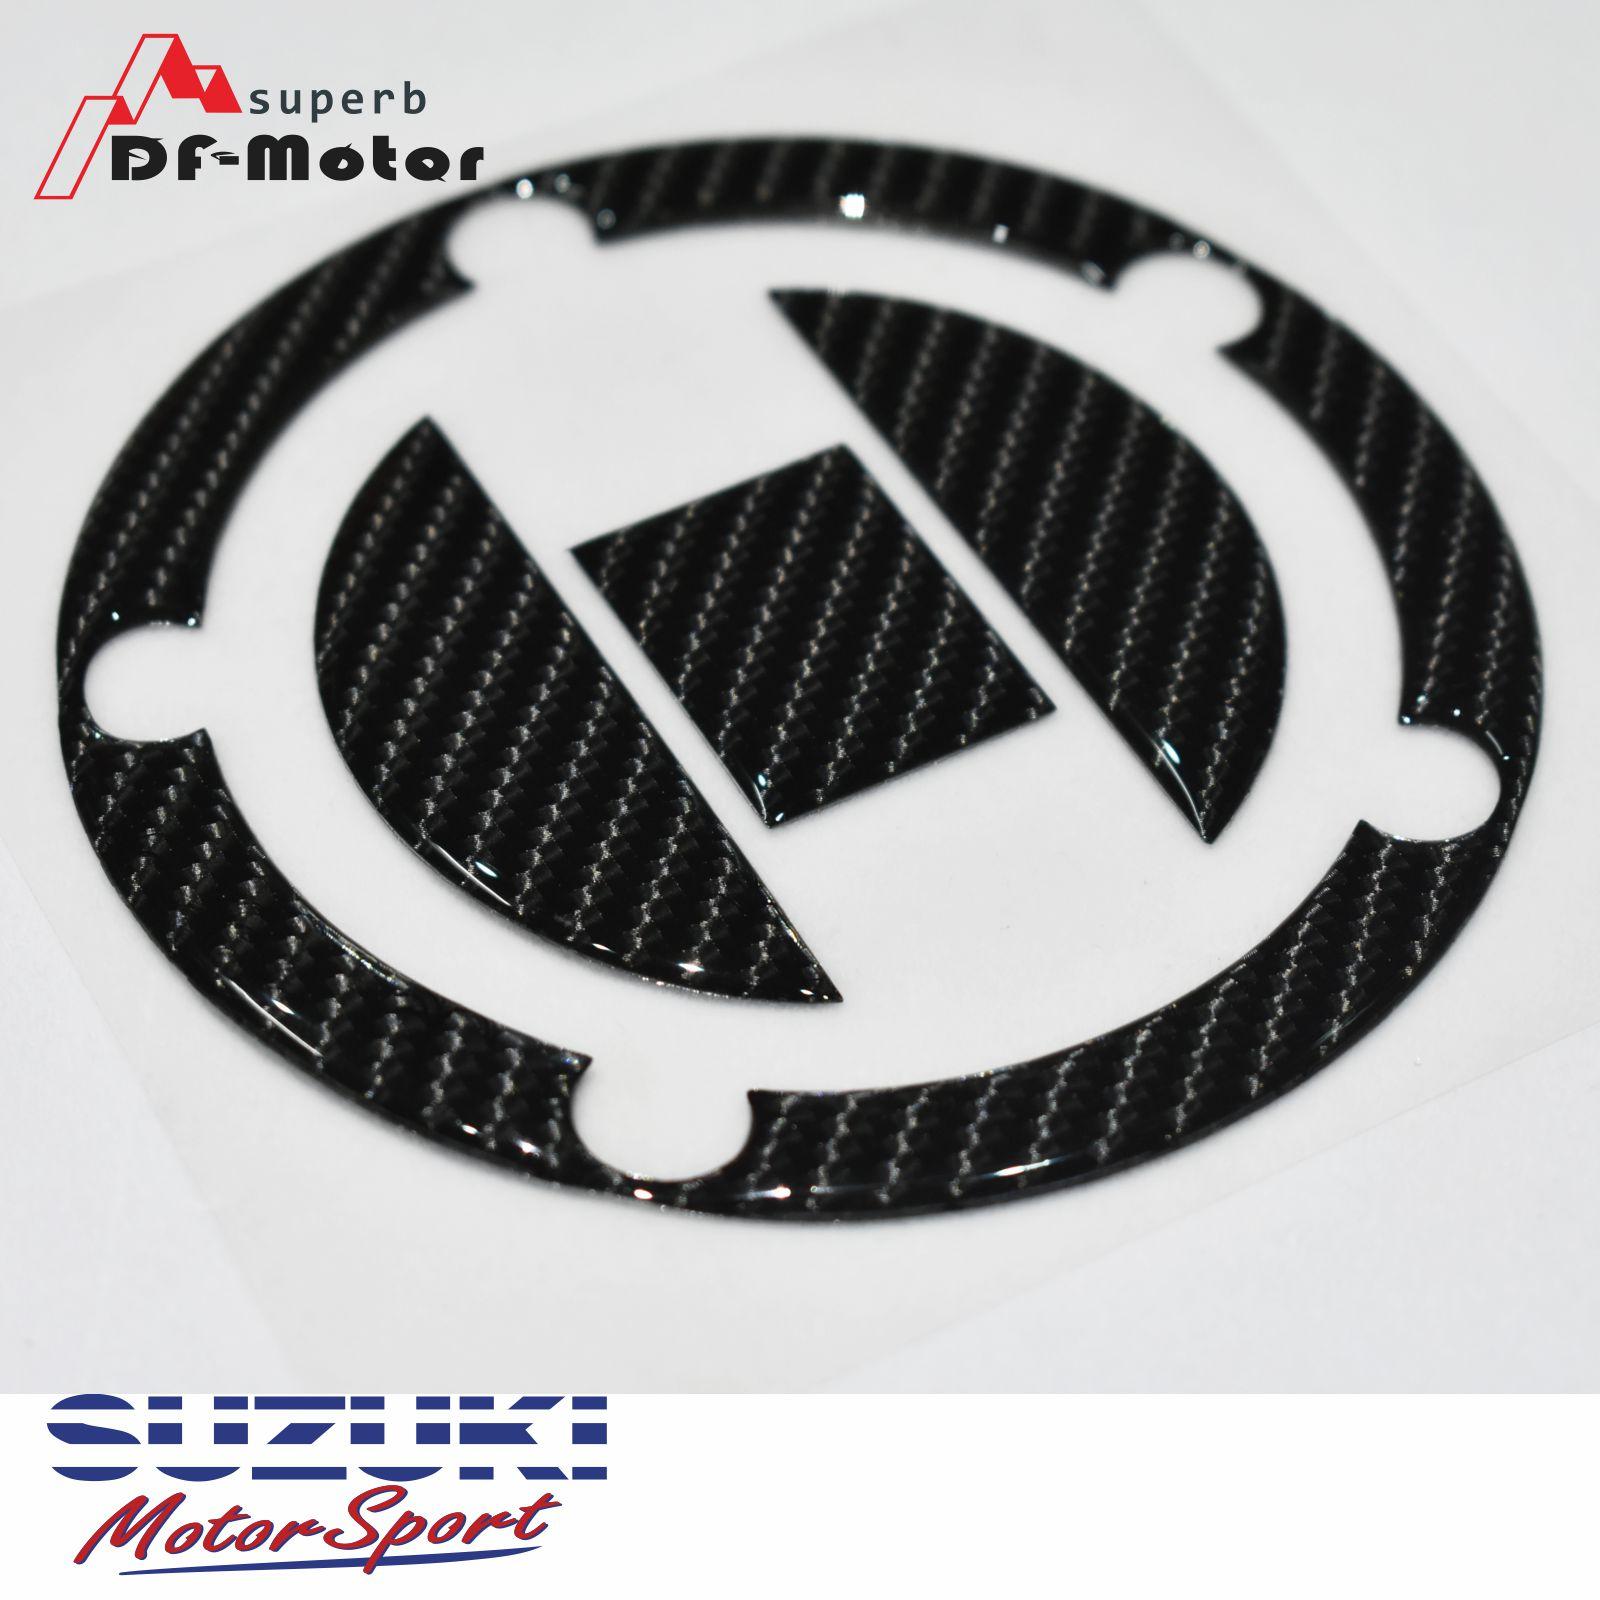 Real Carbon 3D Sticker Decal Emblem Protection Tank Pad Gas Cap For SUZUKI GSXR600 750 1000 1300 Hayabusa